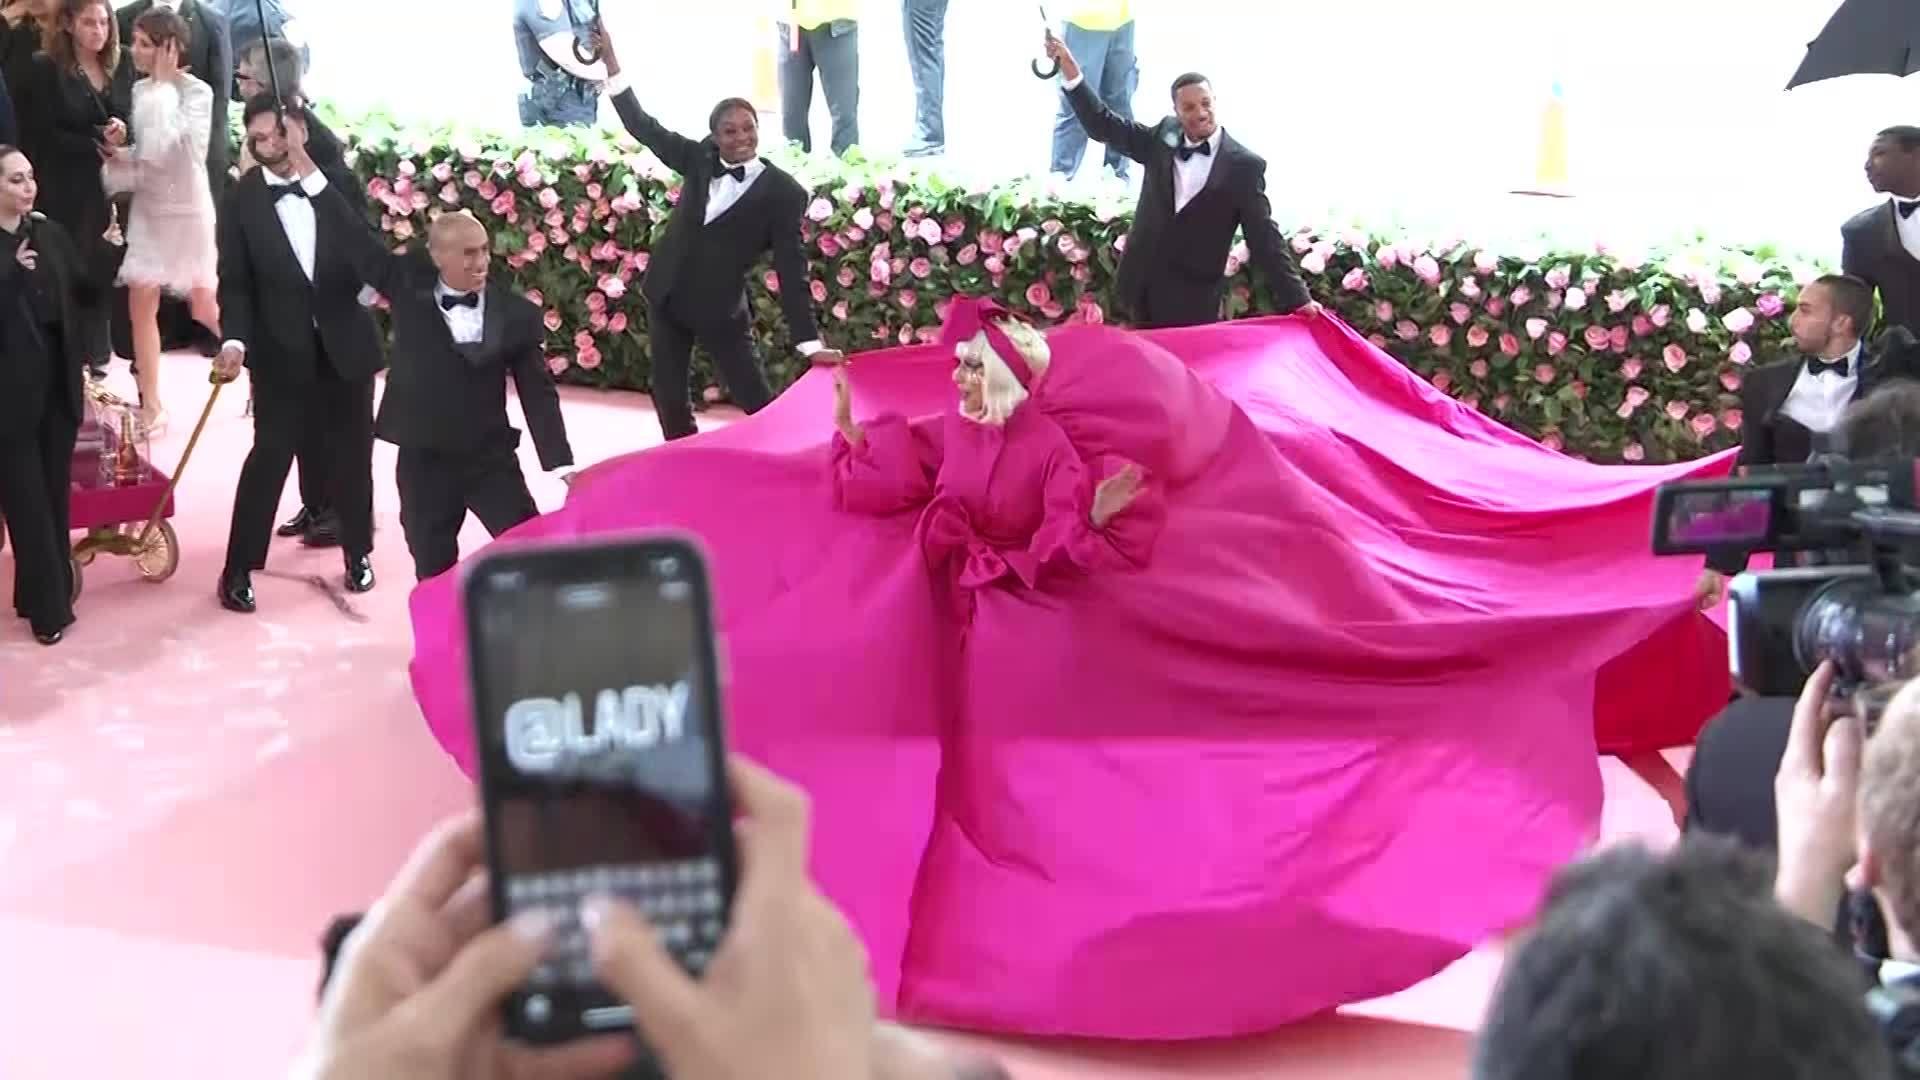 Met Gala: Lady Gaga changes dresses 3 times